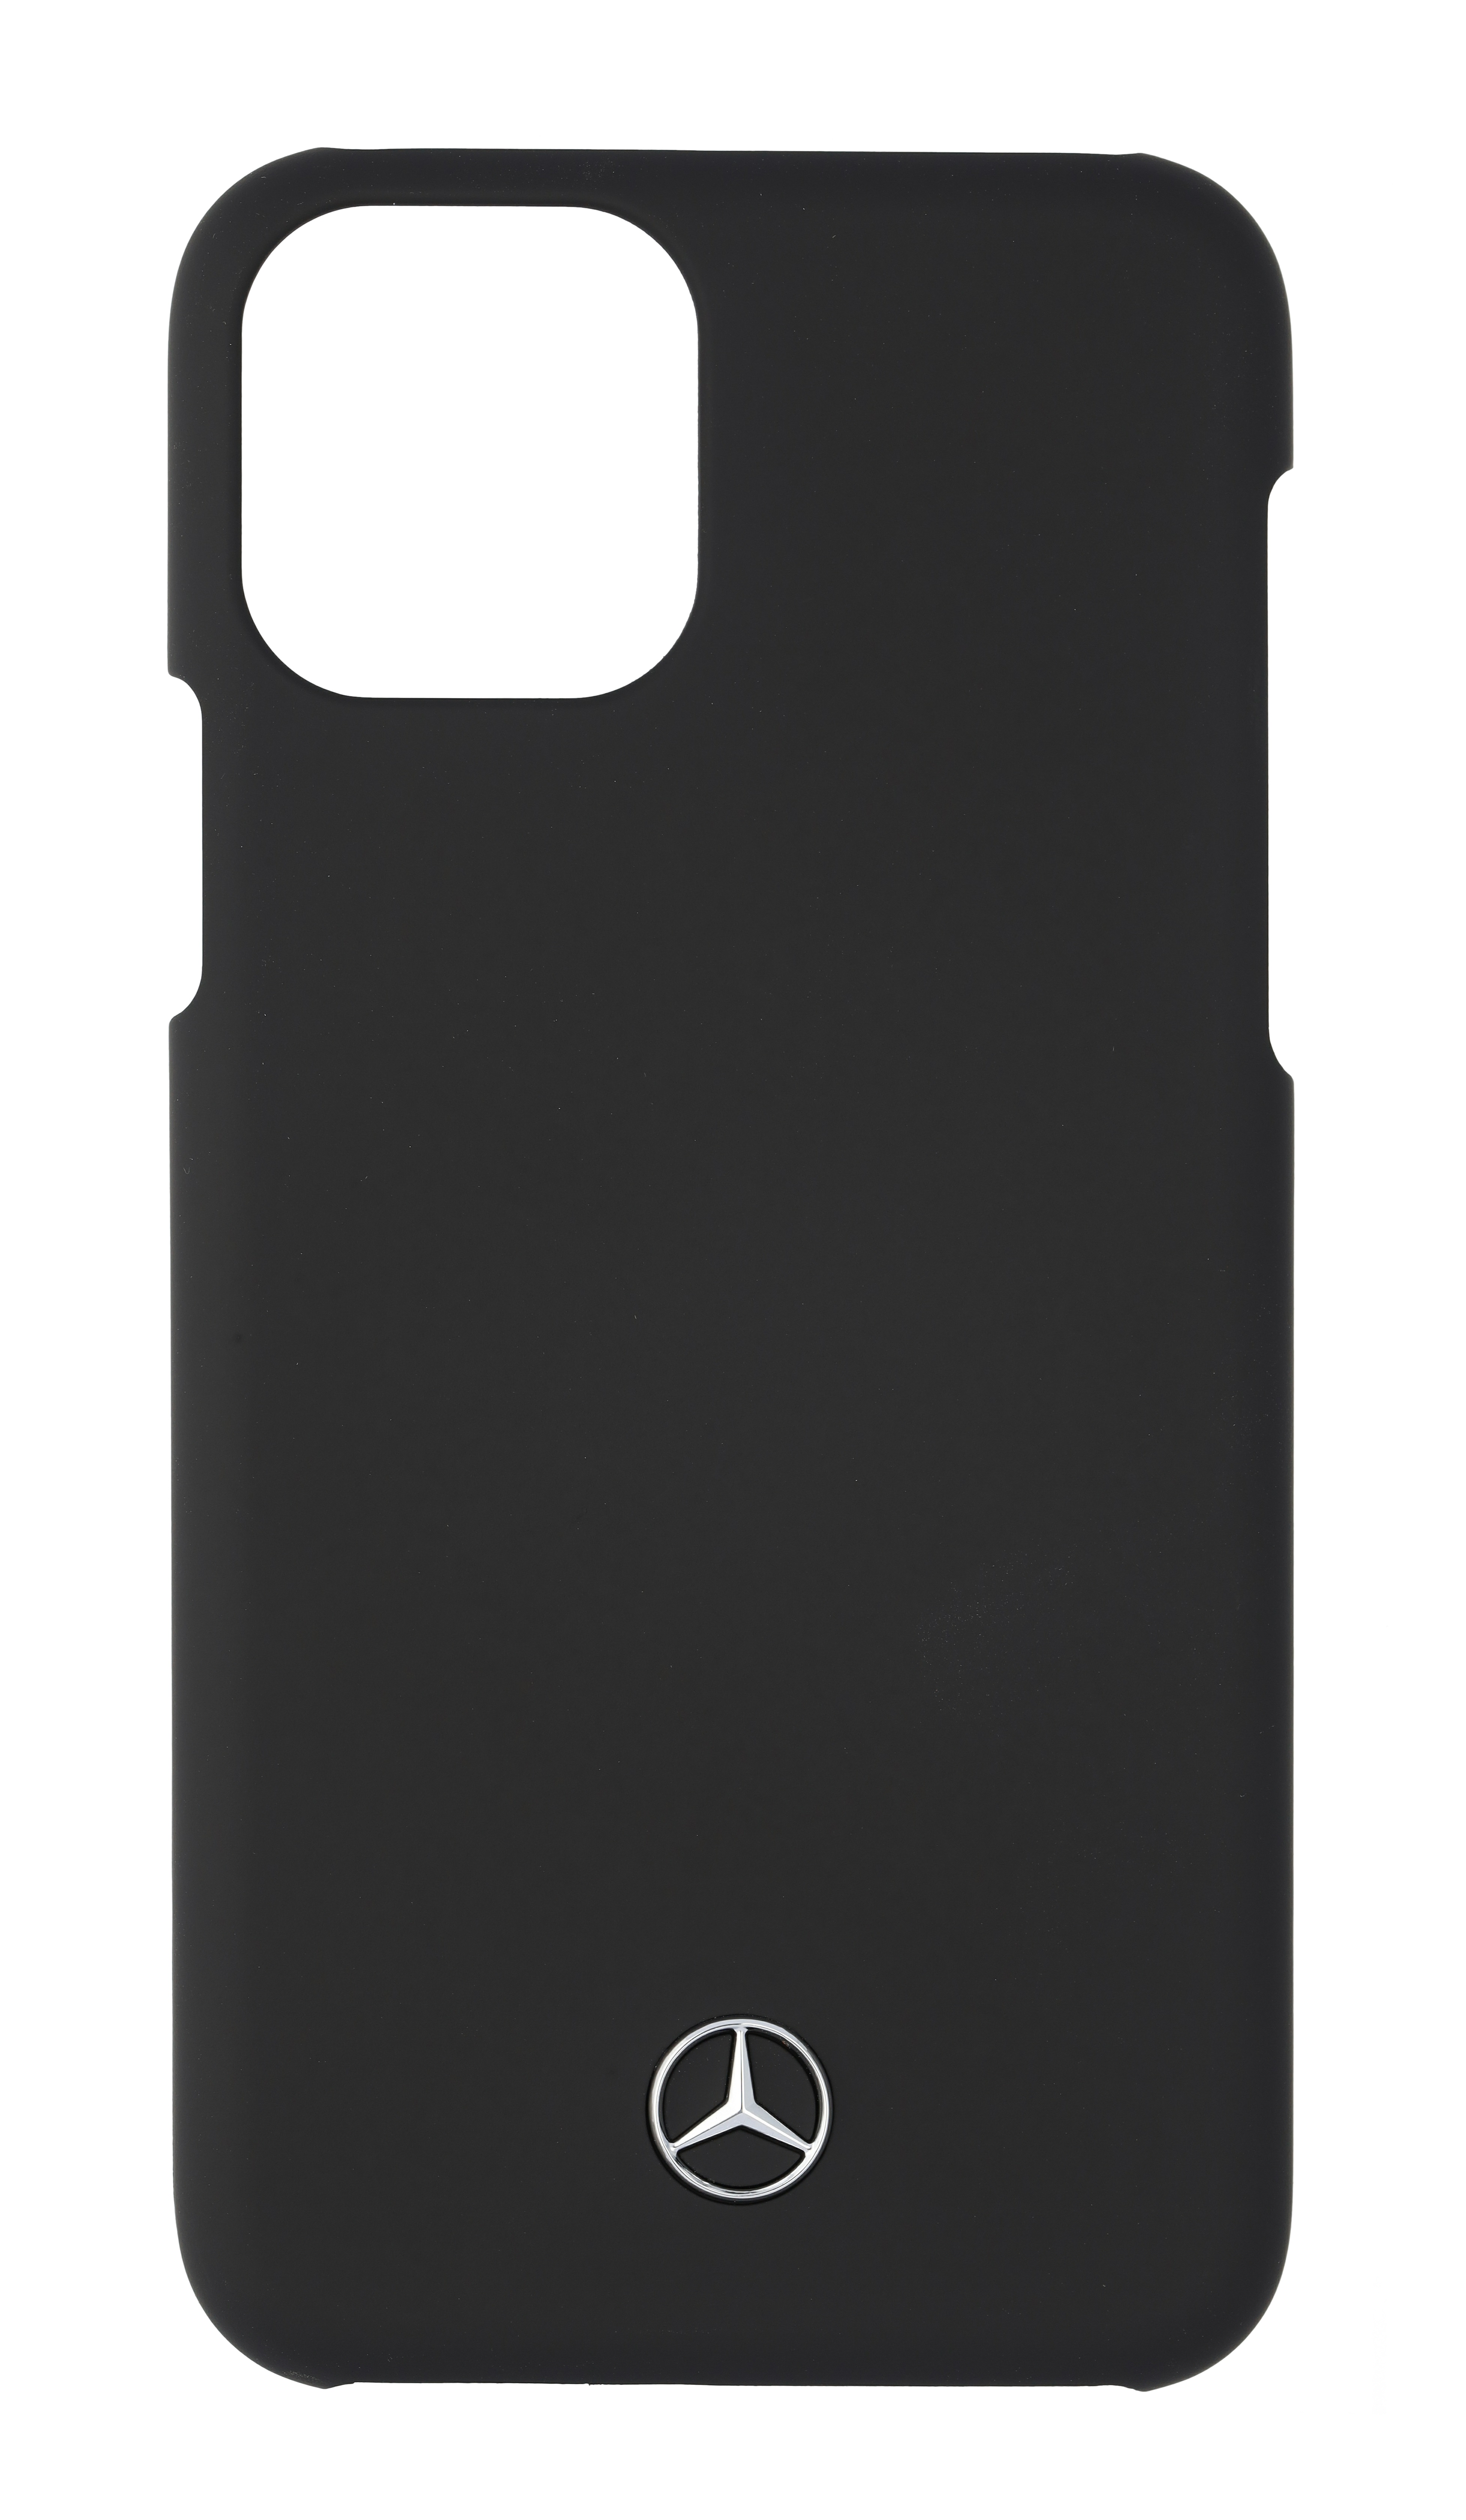 Etui pour iPhone®11 Pro